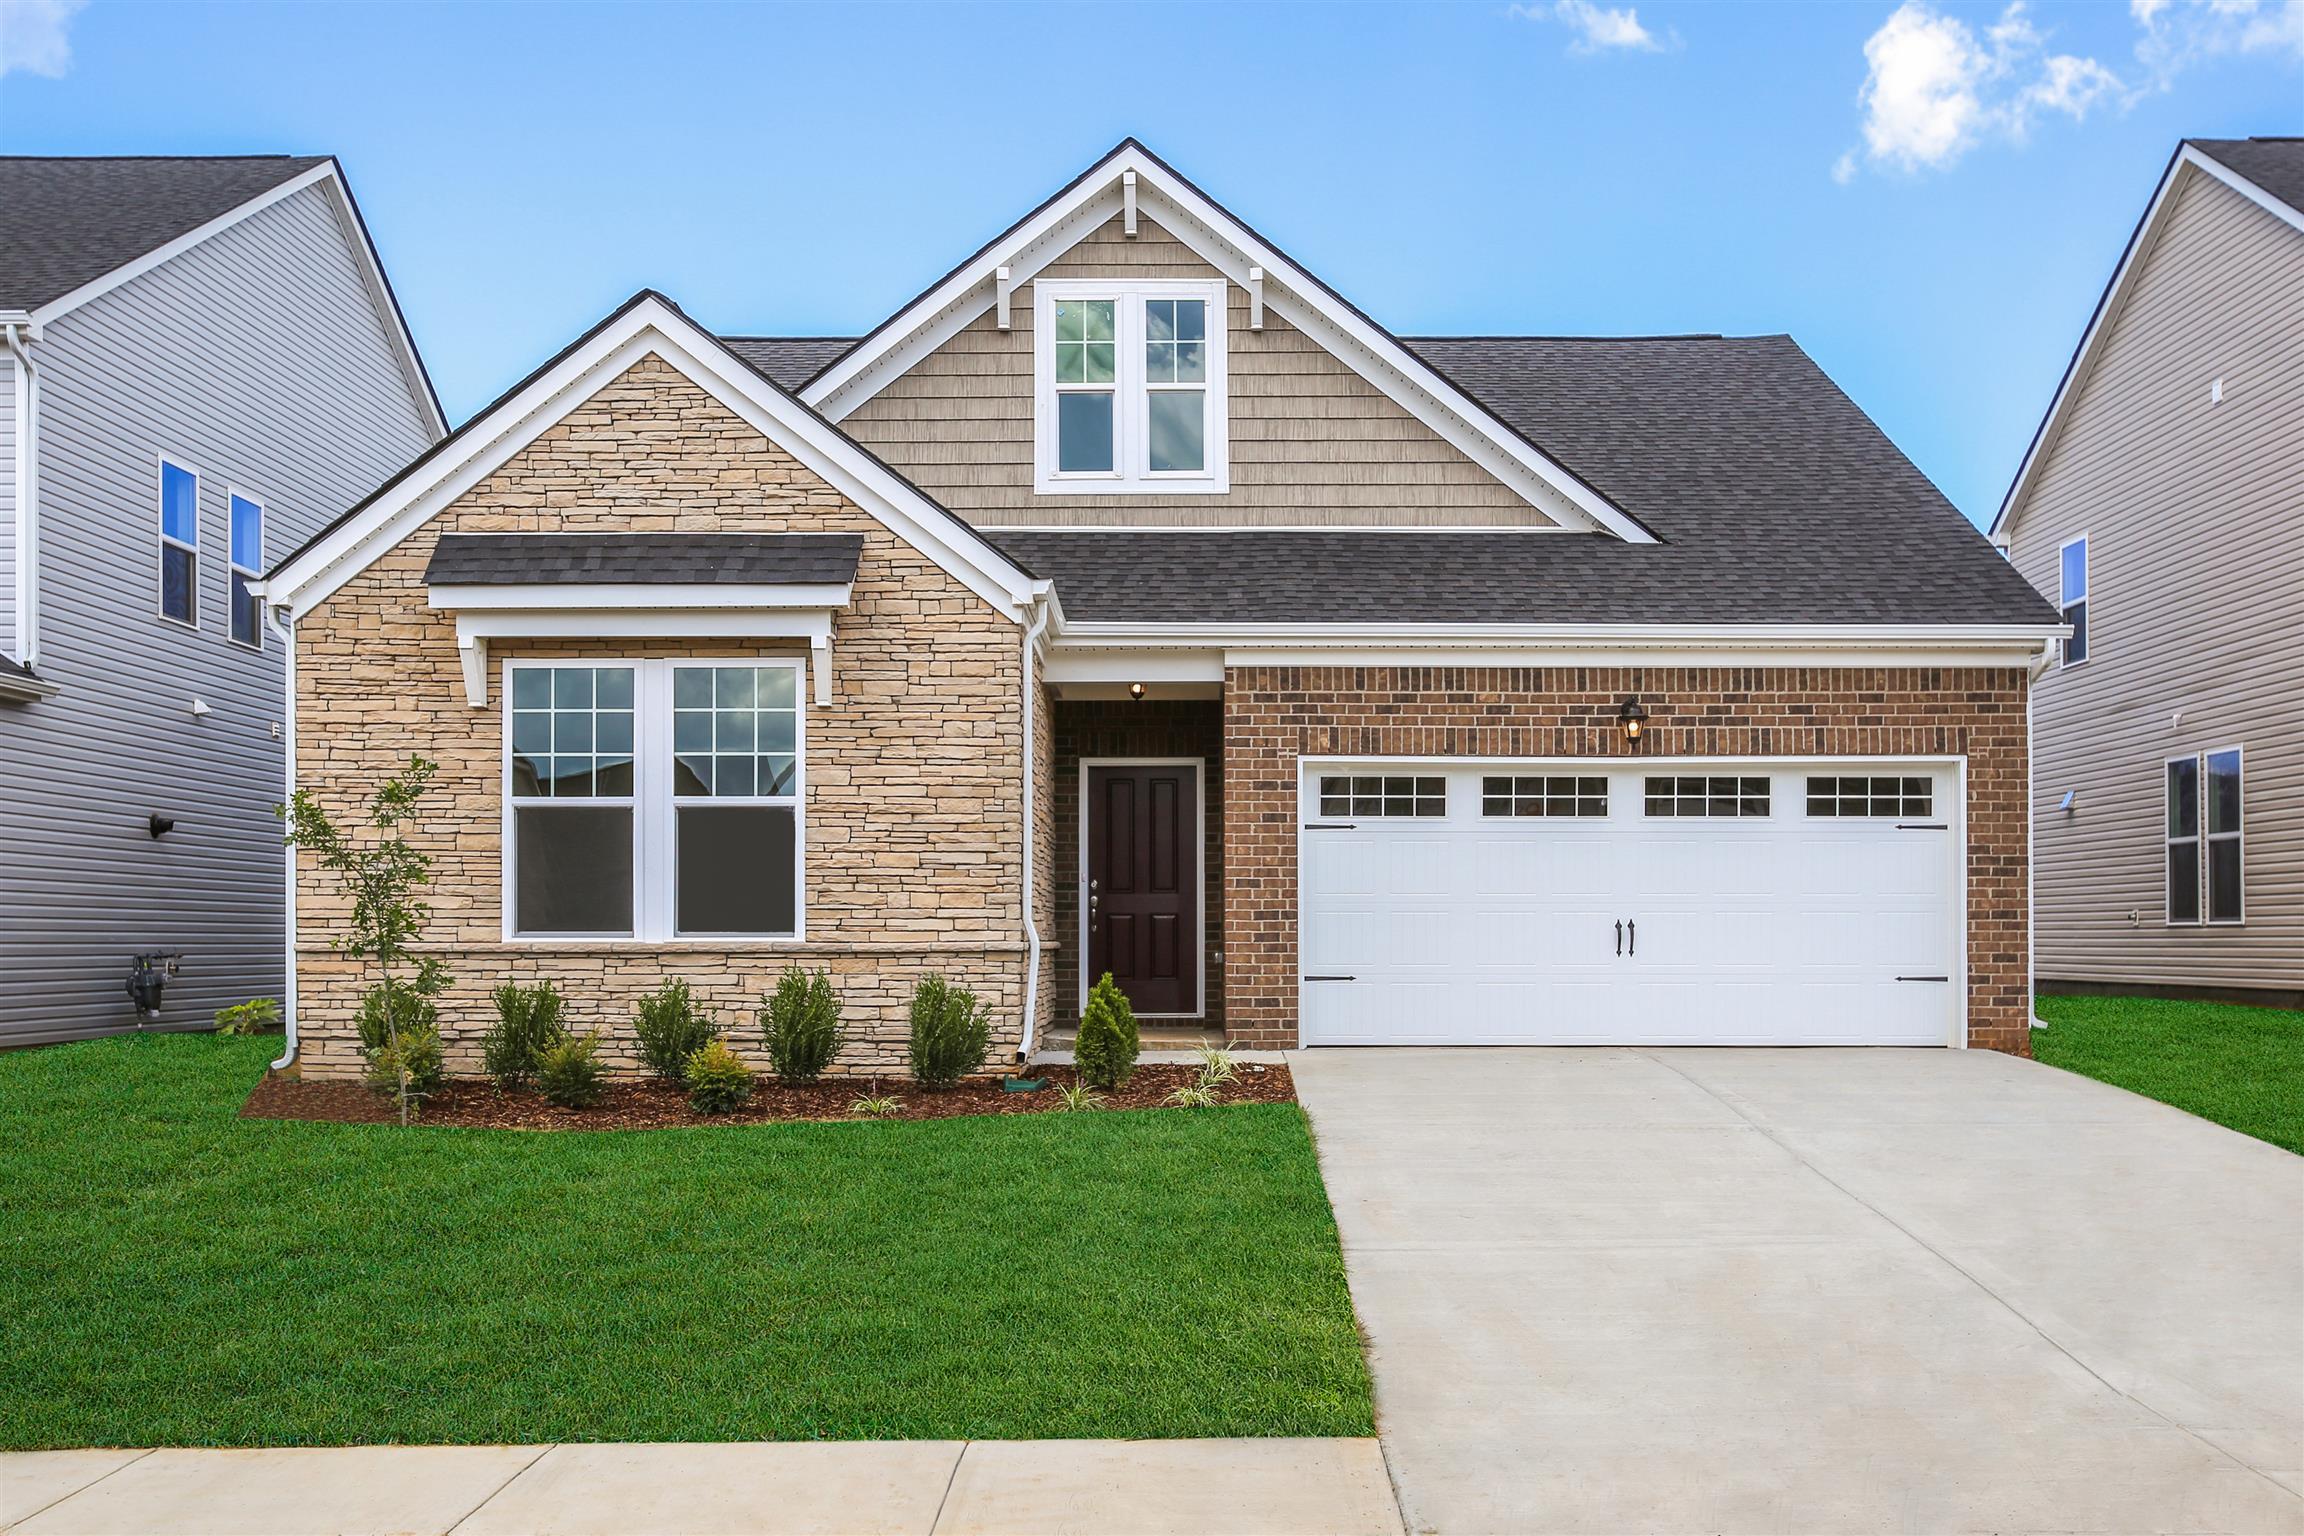 3242 Amaranth Ave (Lot 192), Murfreesboro, TN 37128